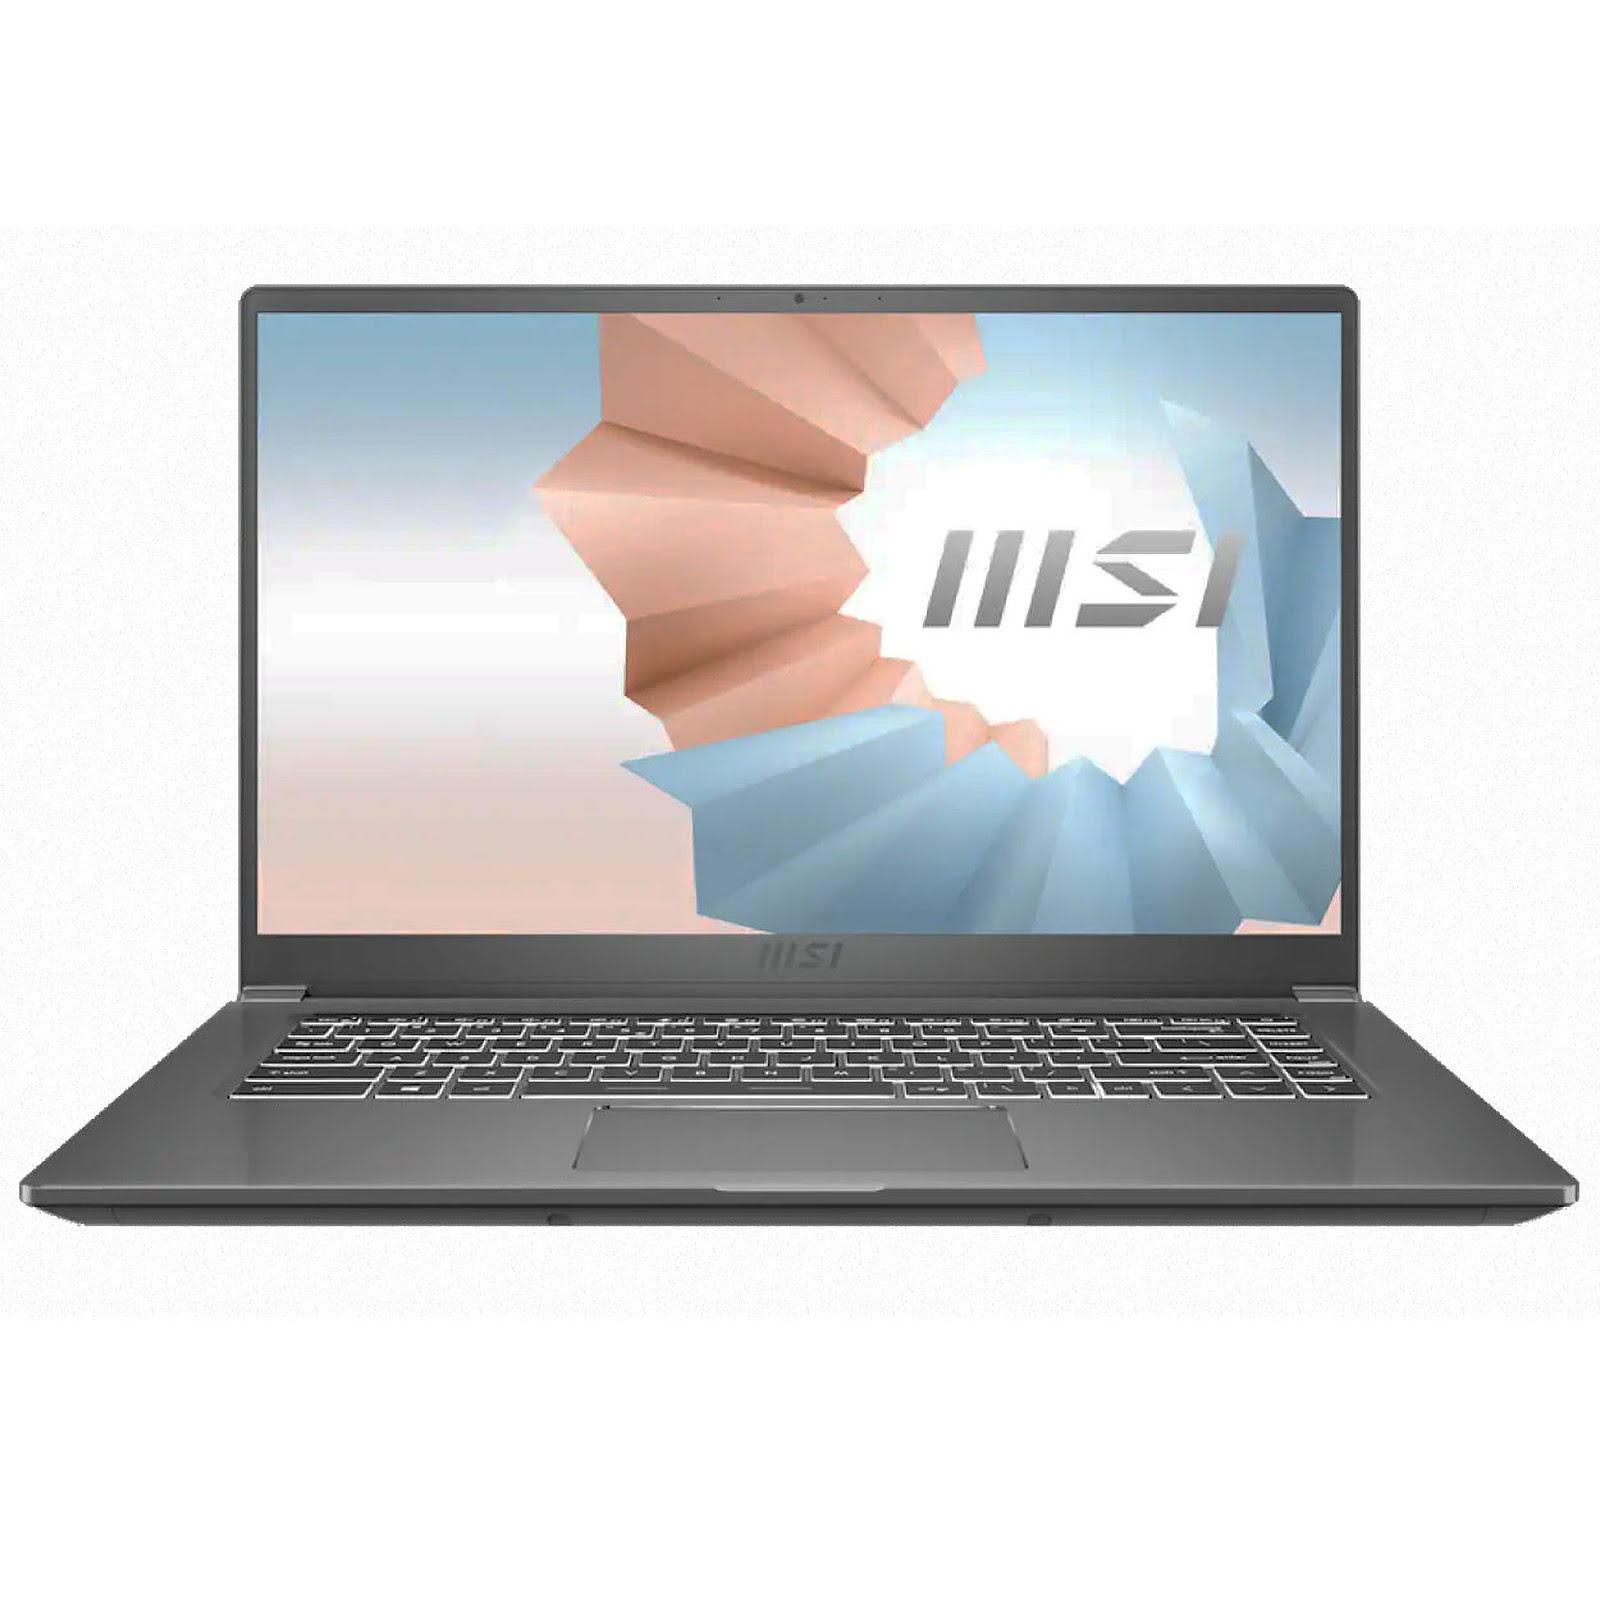 MSI 9S7-155226-052 - PC portable MSI - Cybertek.fr - 0